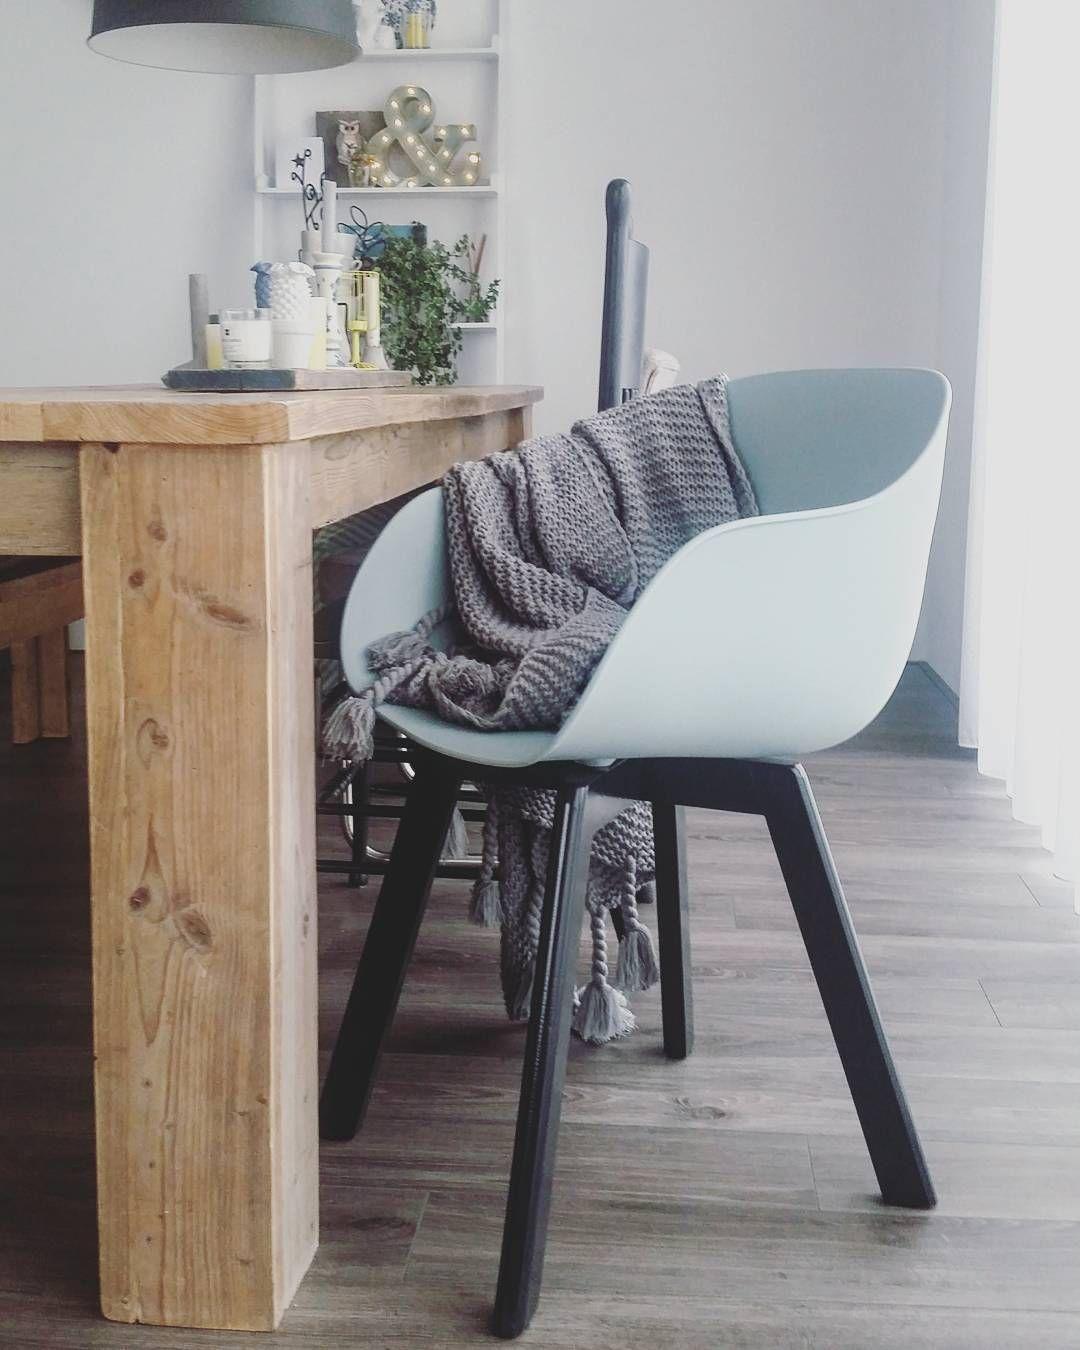 #kwantum repin  stoel NEW YORK  u0026gt; https     www kwantum nl  meubelen  stoelen  meubelen stoelen